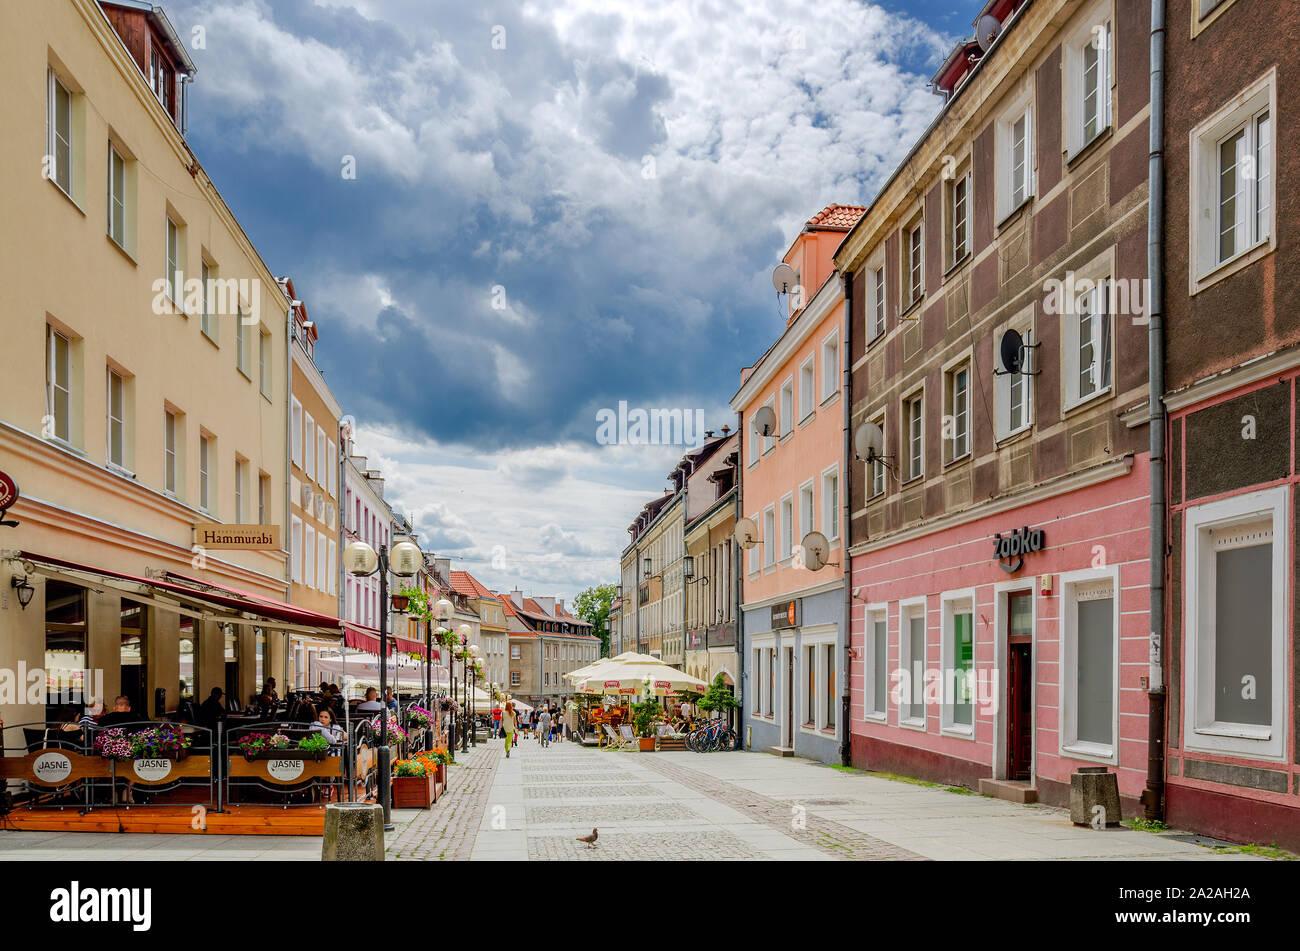 Olsztyn (ger.: Allenstein), Warmian-mazurian province, Poland. Prosta street in the Old Town district. Stock Photo